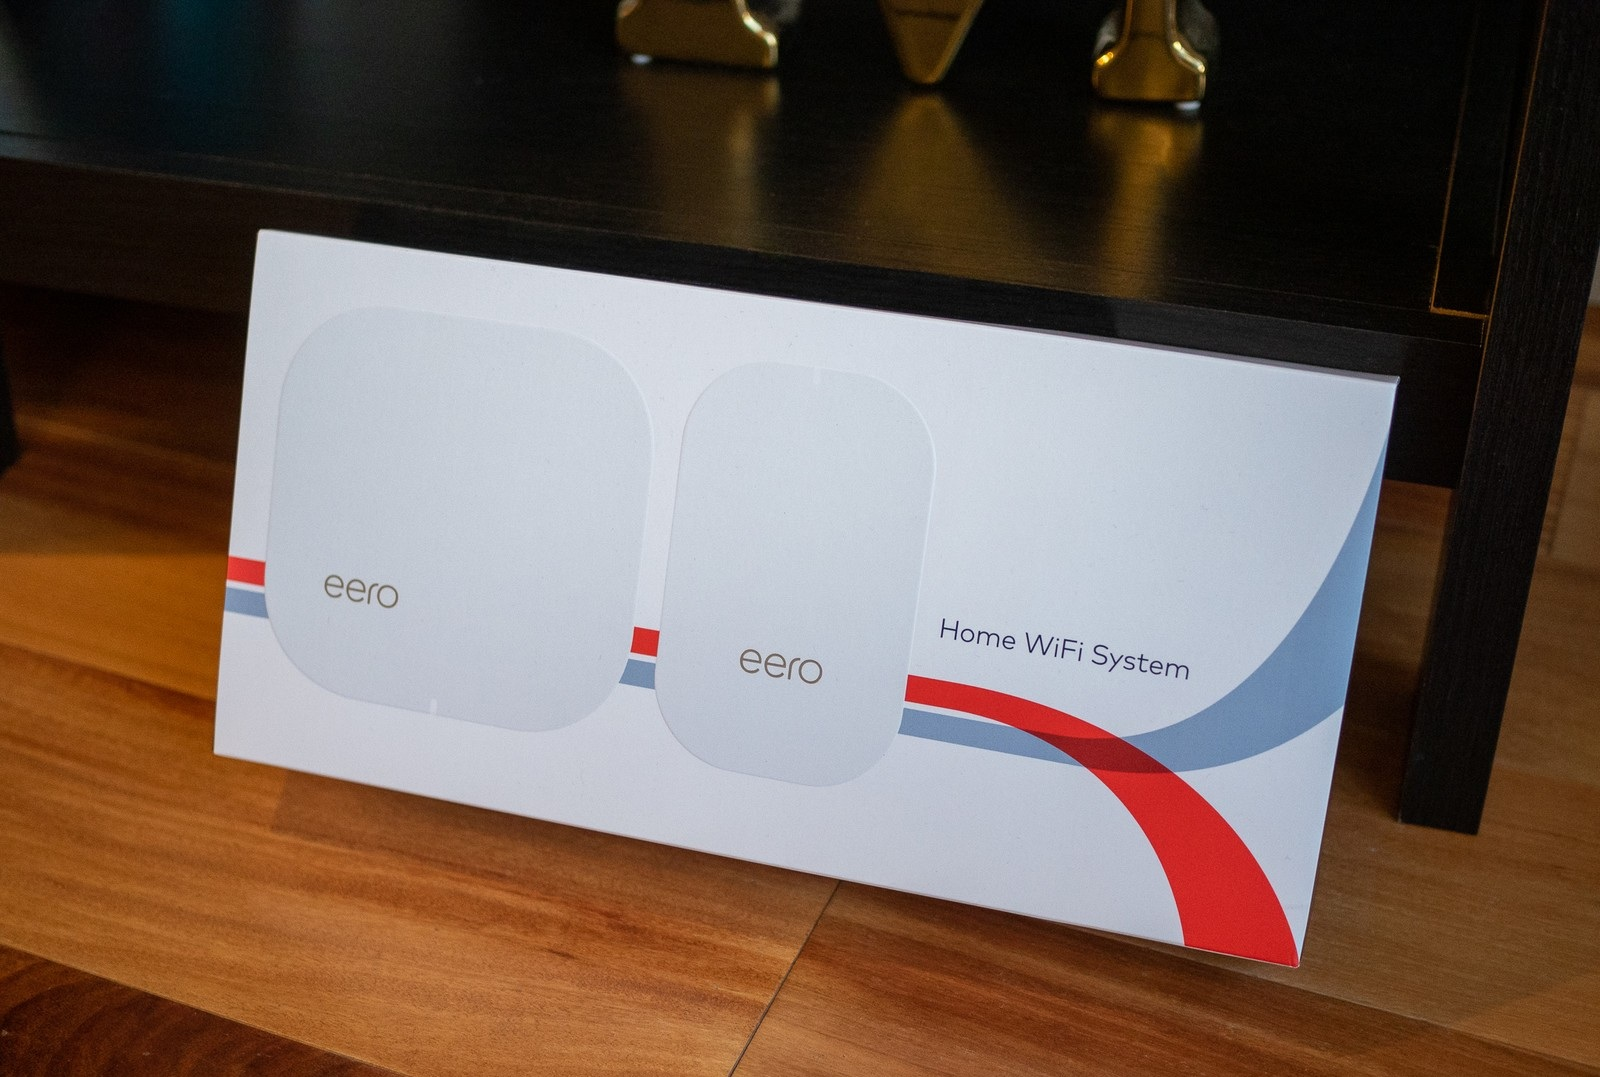 eero-wifi-starter-kit-box.jpg